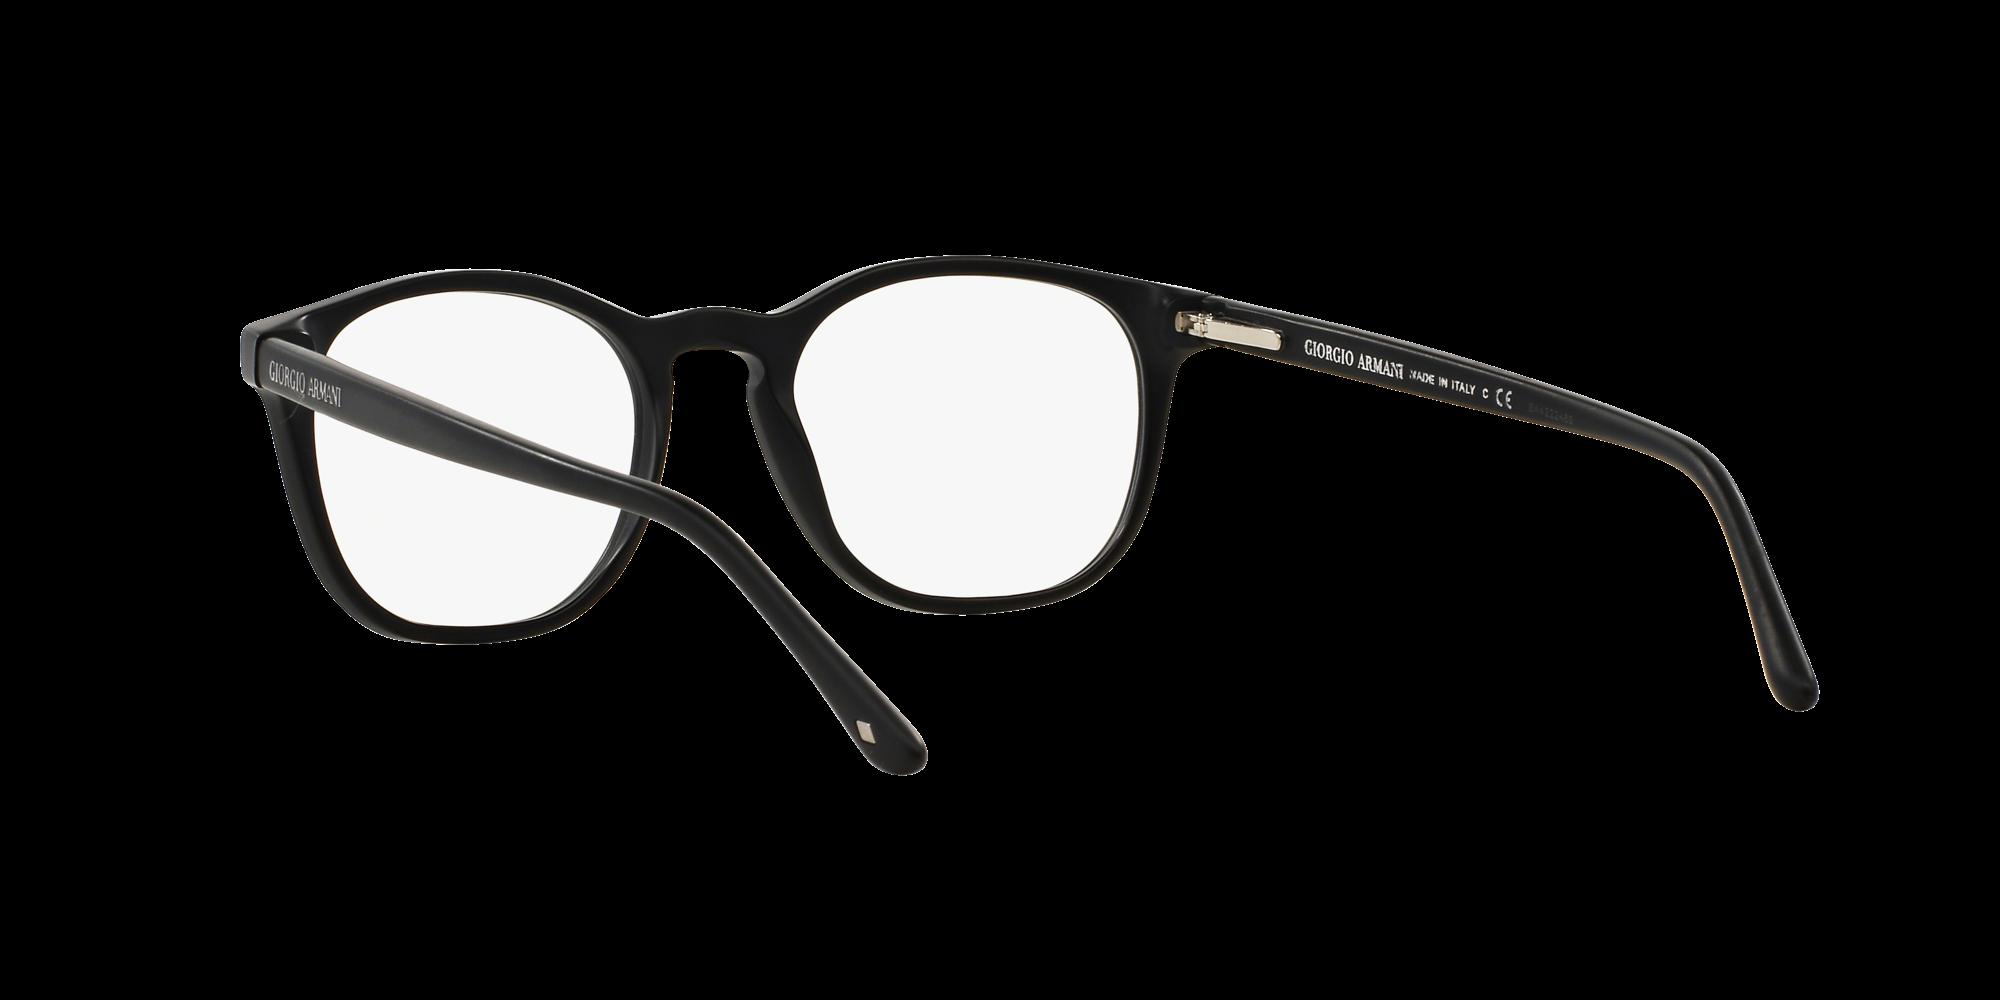 9b59d711930 Eyeglasses Giorgio Armani Frames Of Life Black Matte AR7074 5042 50-19  Medium